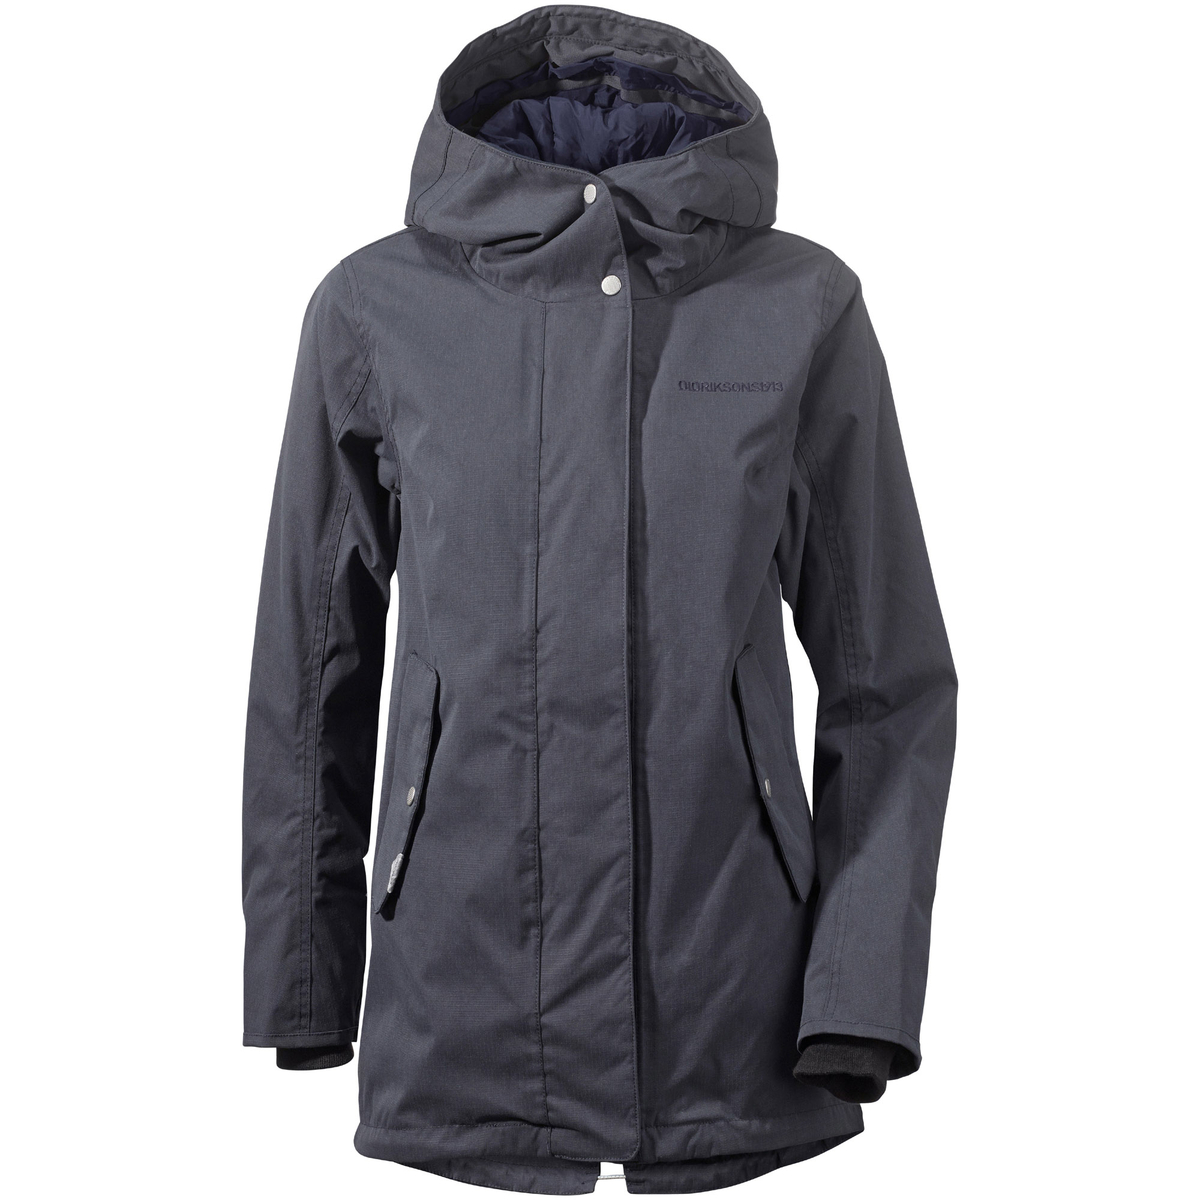 f5997e683ff1 vinterjackor didriksons patch jacket dam finns på PricePi.com.